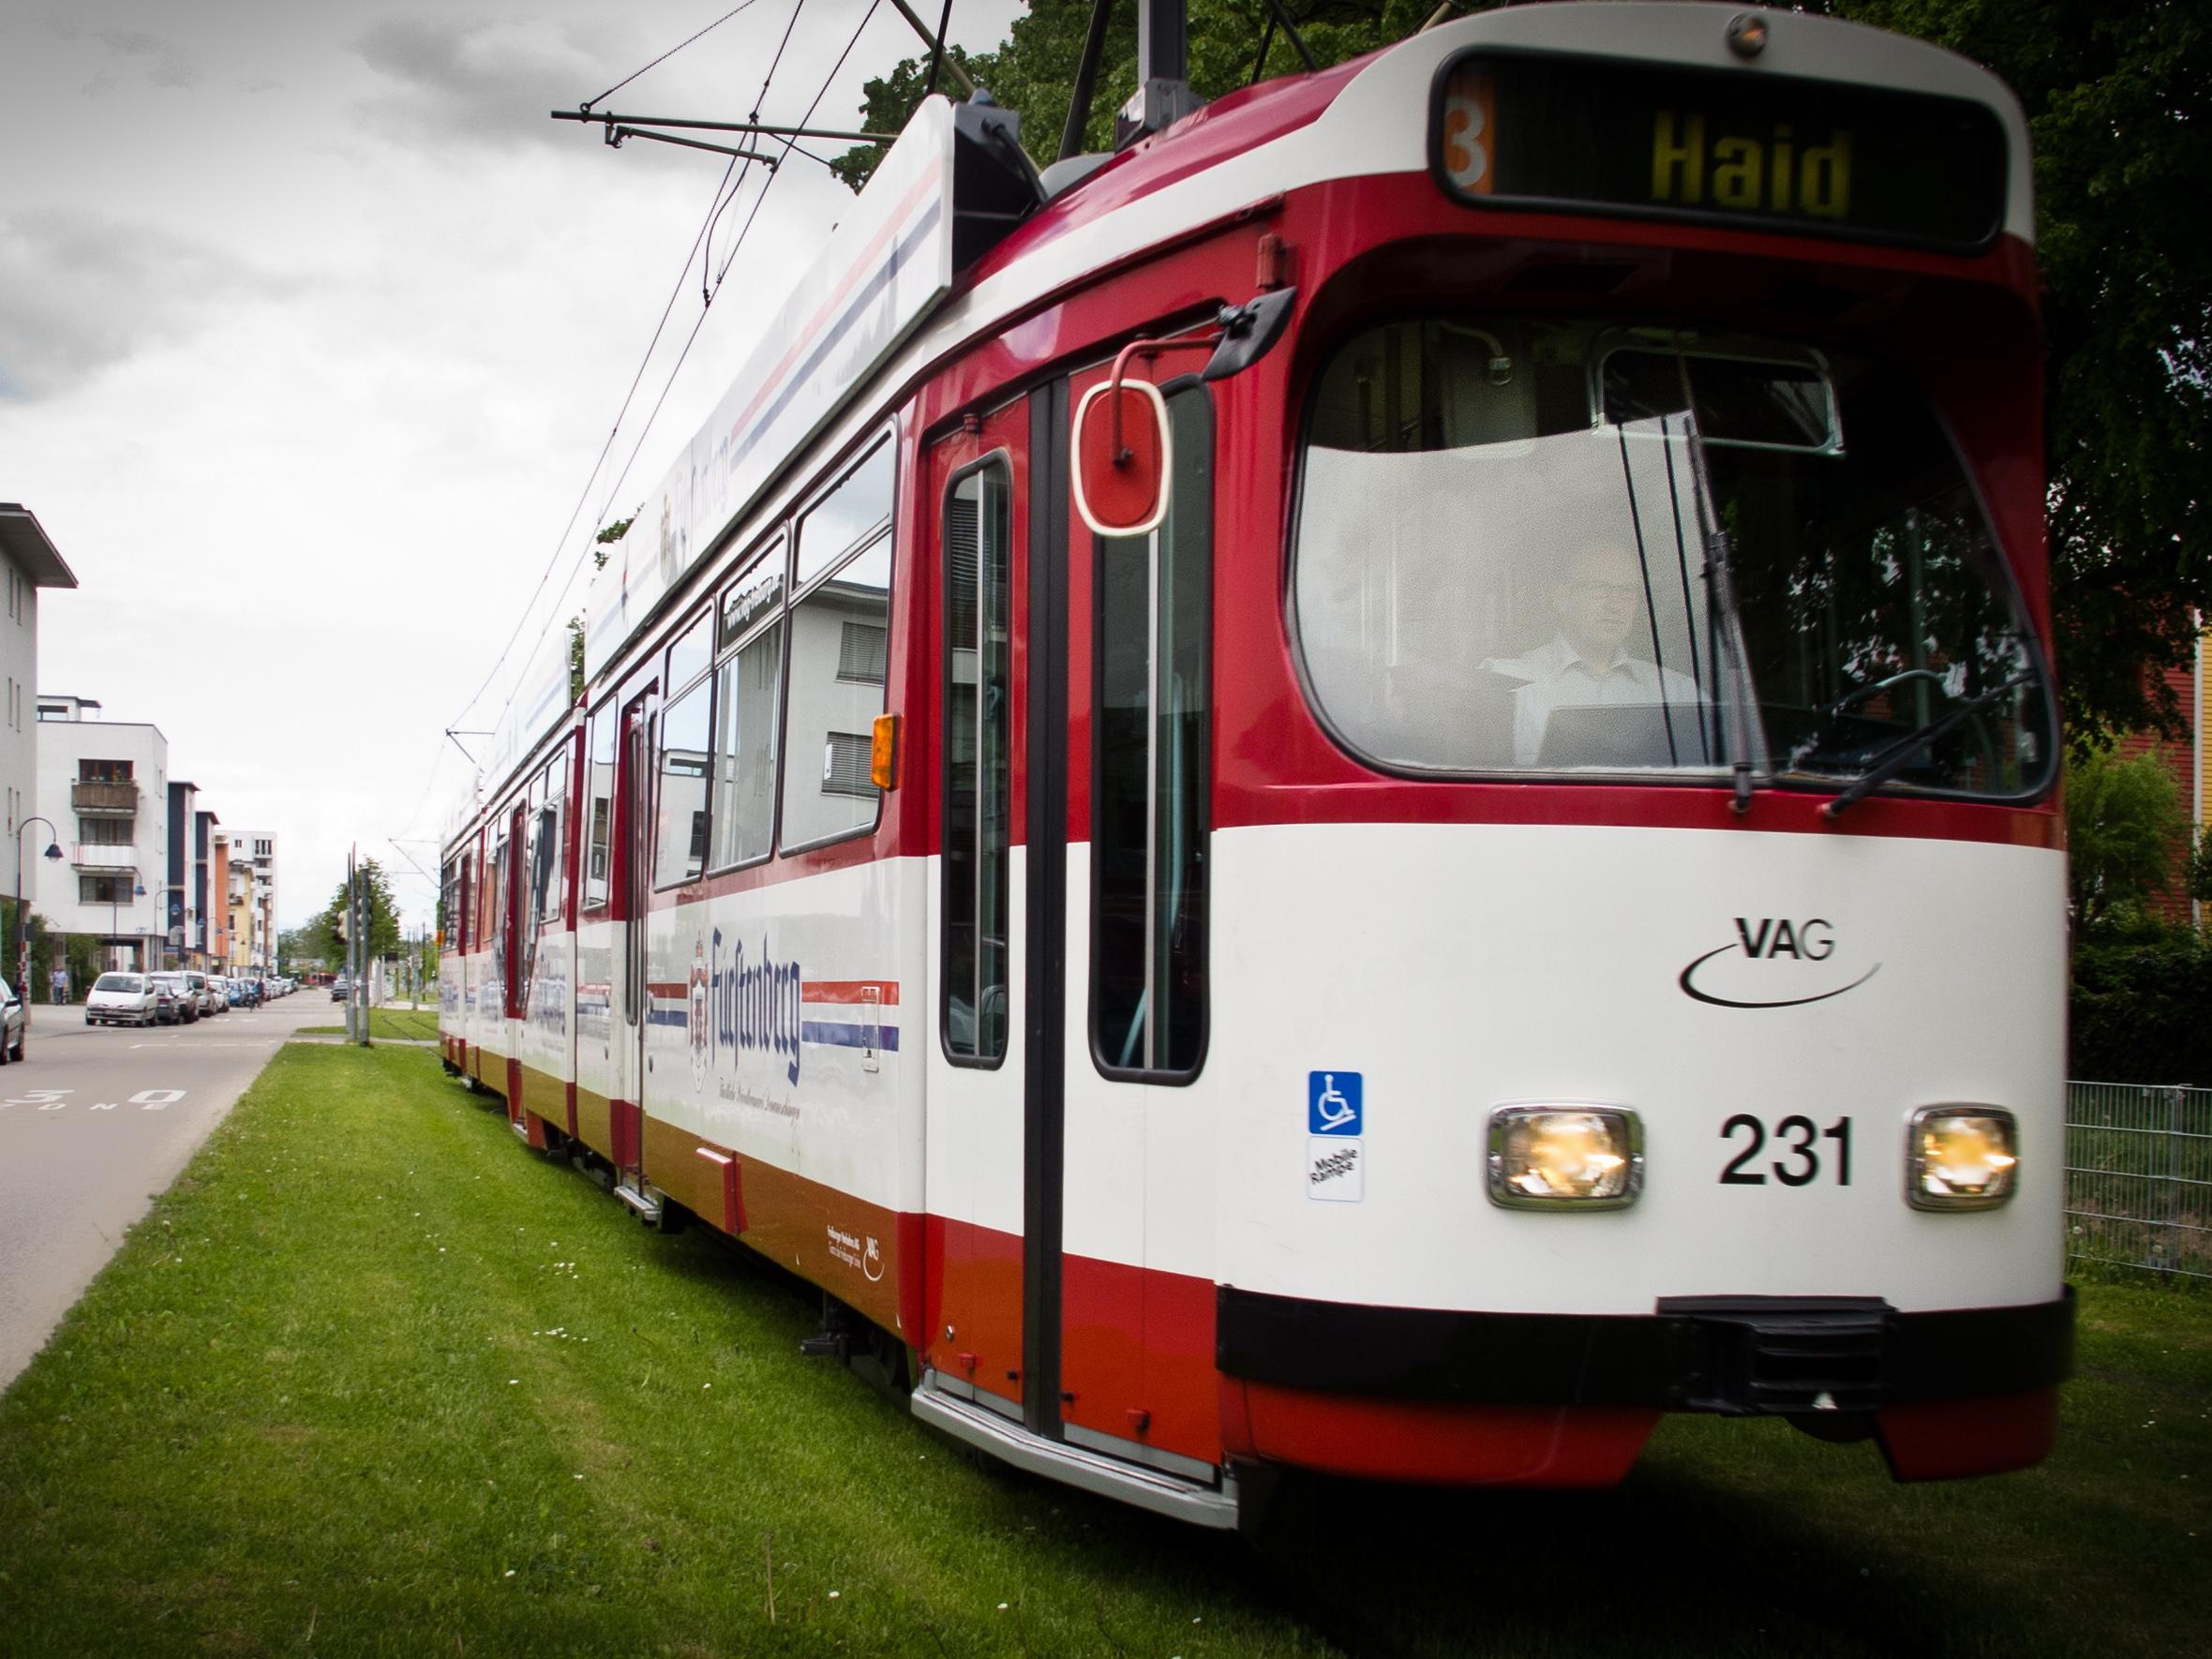 Electric trolley in Vauban, a car-free, energy-efficient zone in Freiburg.